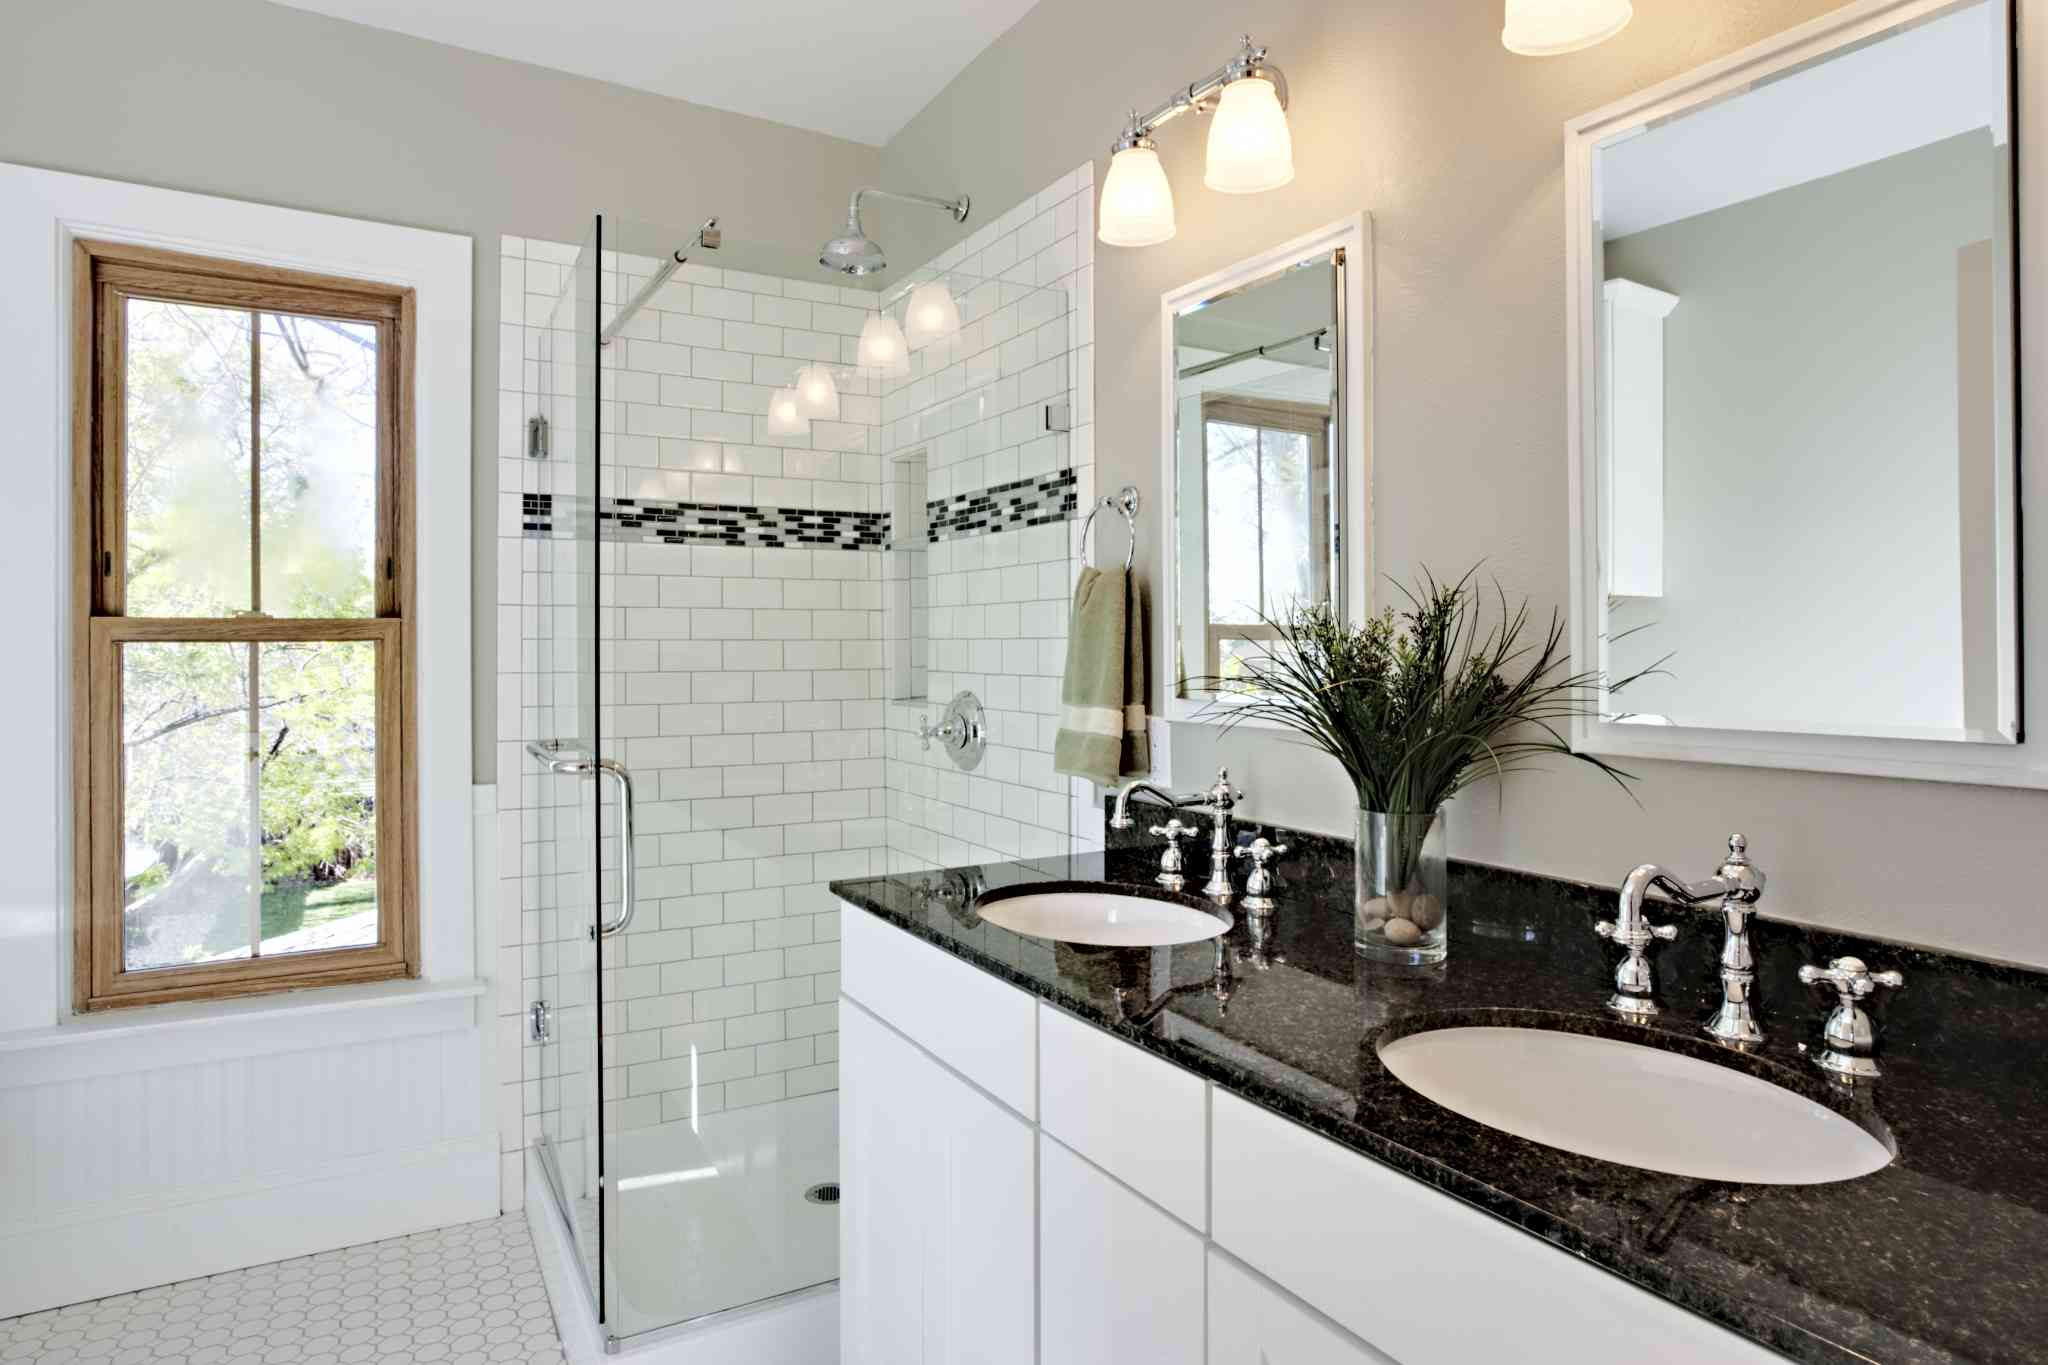 Bathroom Remodeling Trends bathroom remodeling trends - your project loan